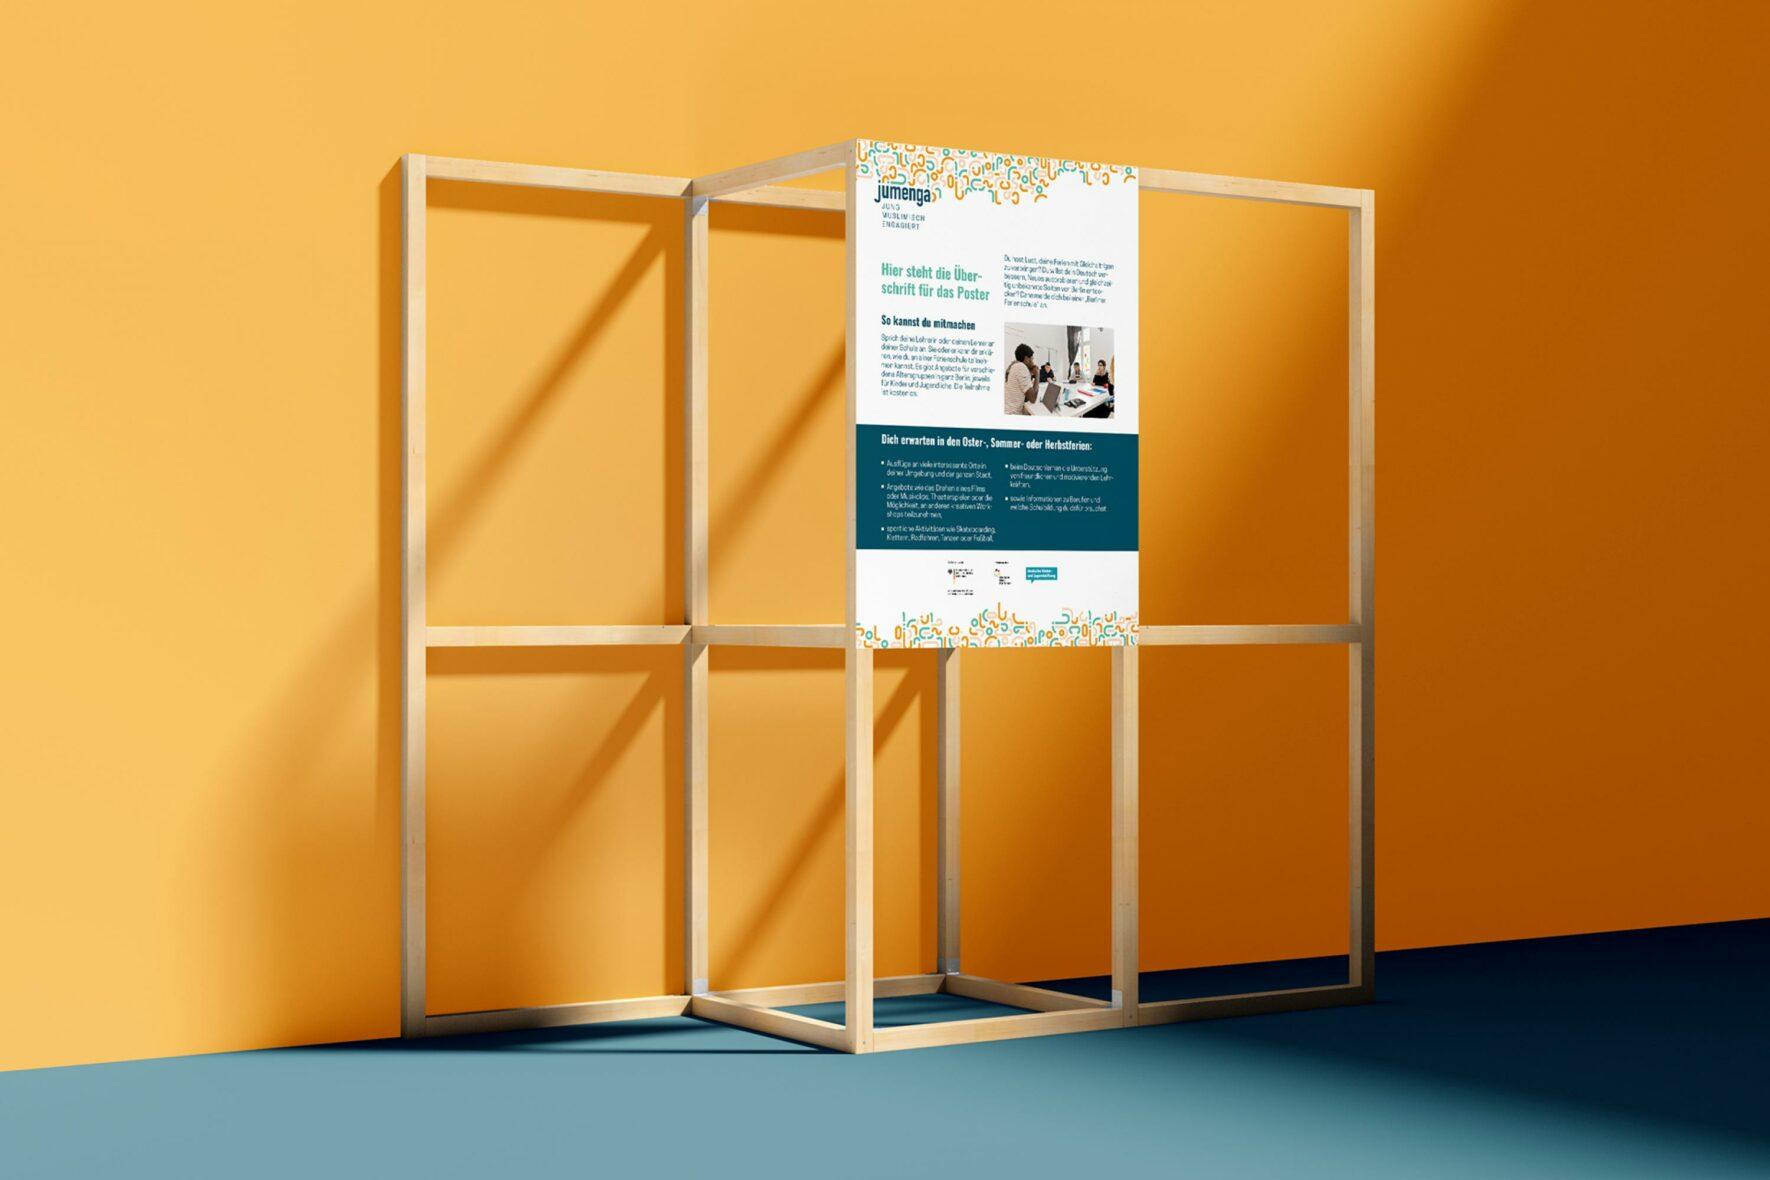 jumenga-Poster-Vorlage-Corporate-Design-Logo-social-FORMLOS-Berlin-Print-vorlage-poster-2